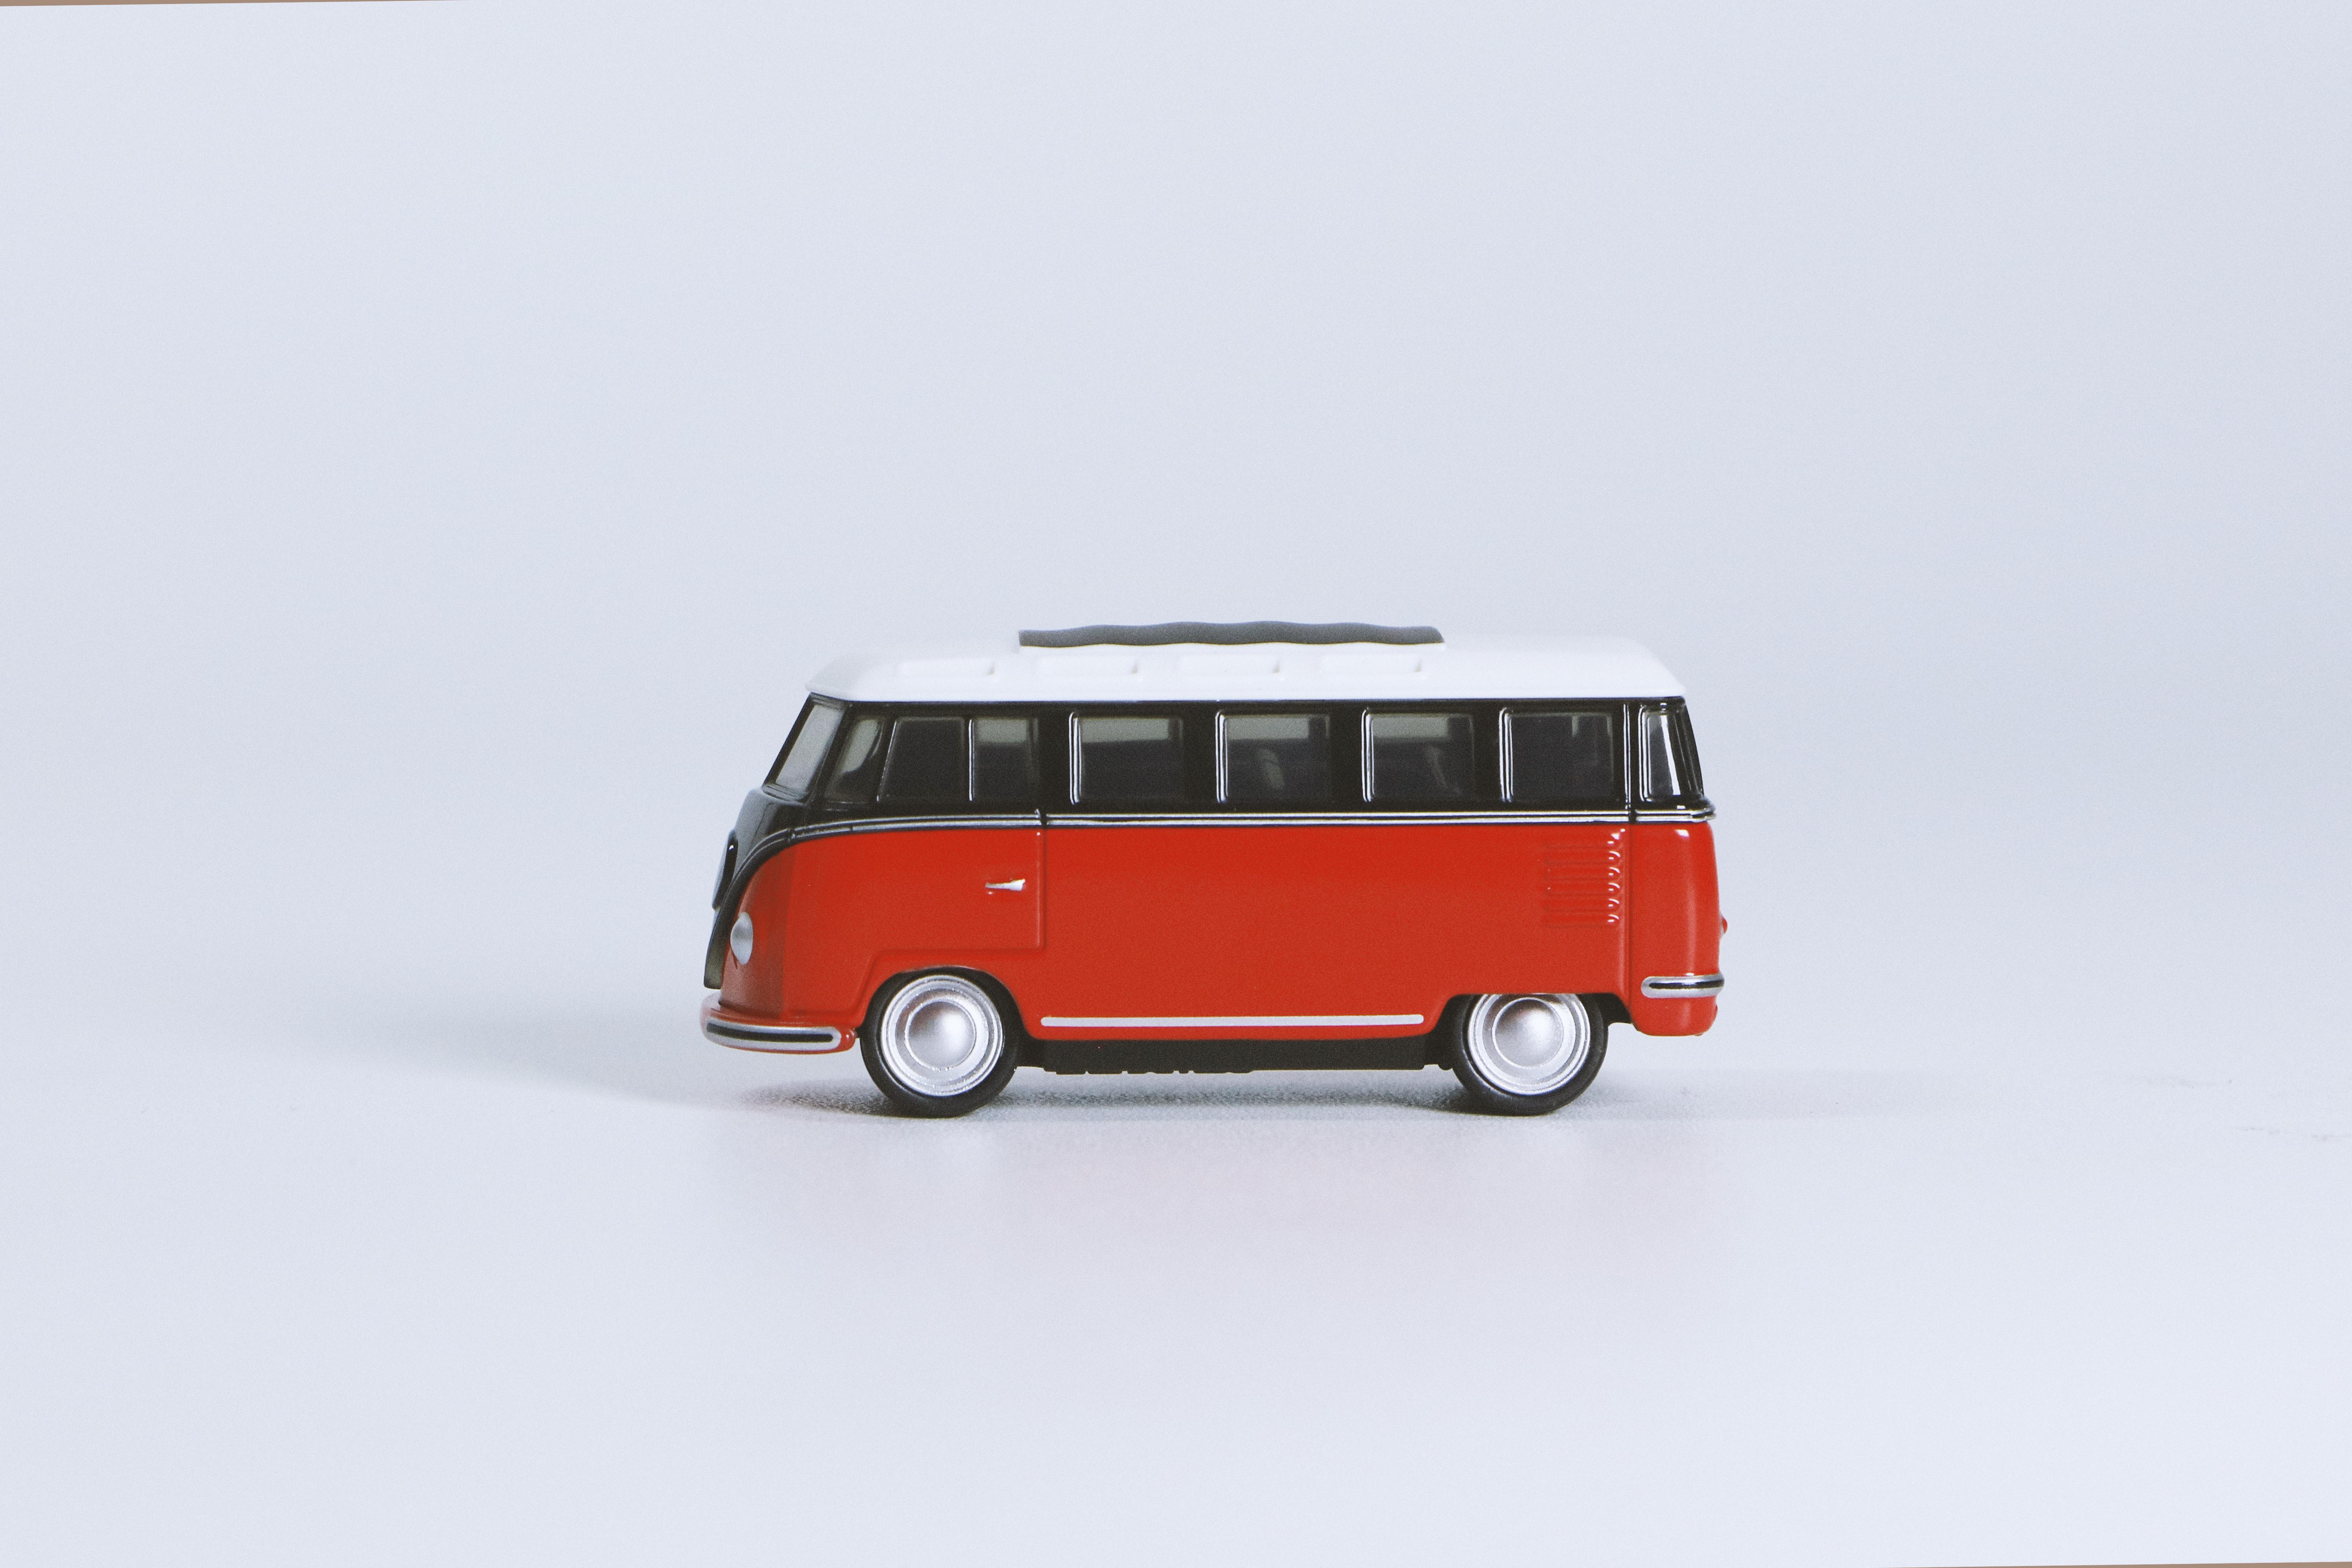 Red Volkswagen T1 Die-cast Toy on White Surface